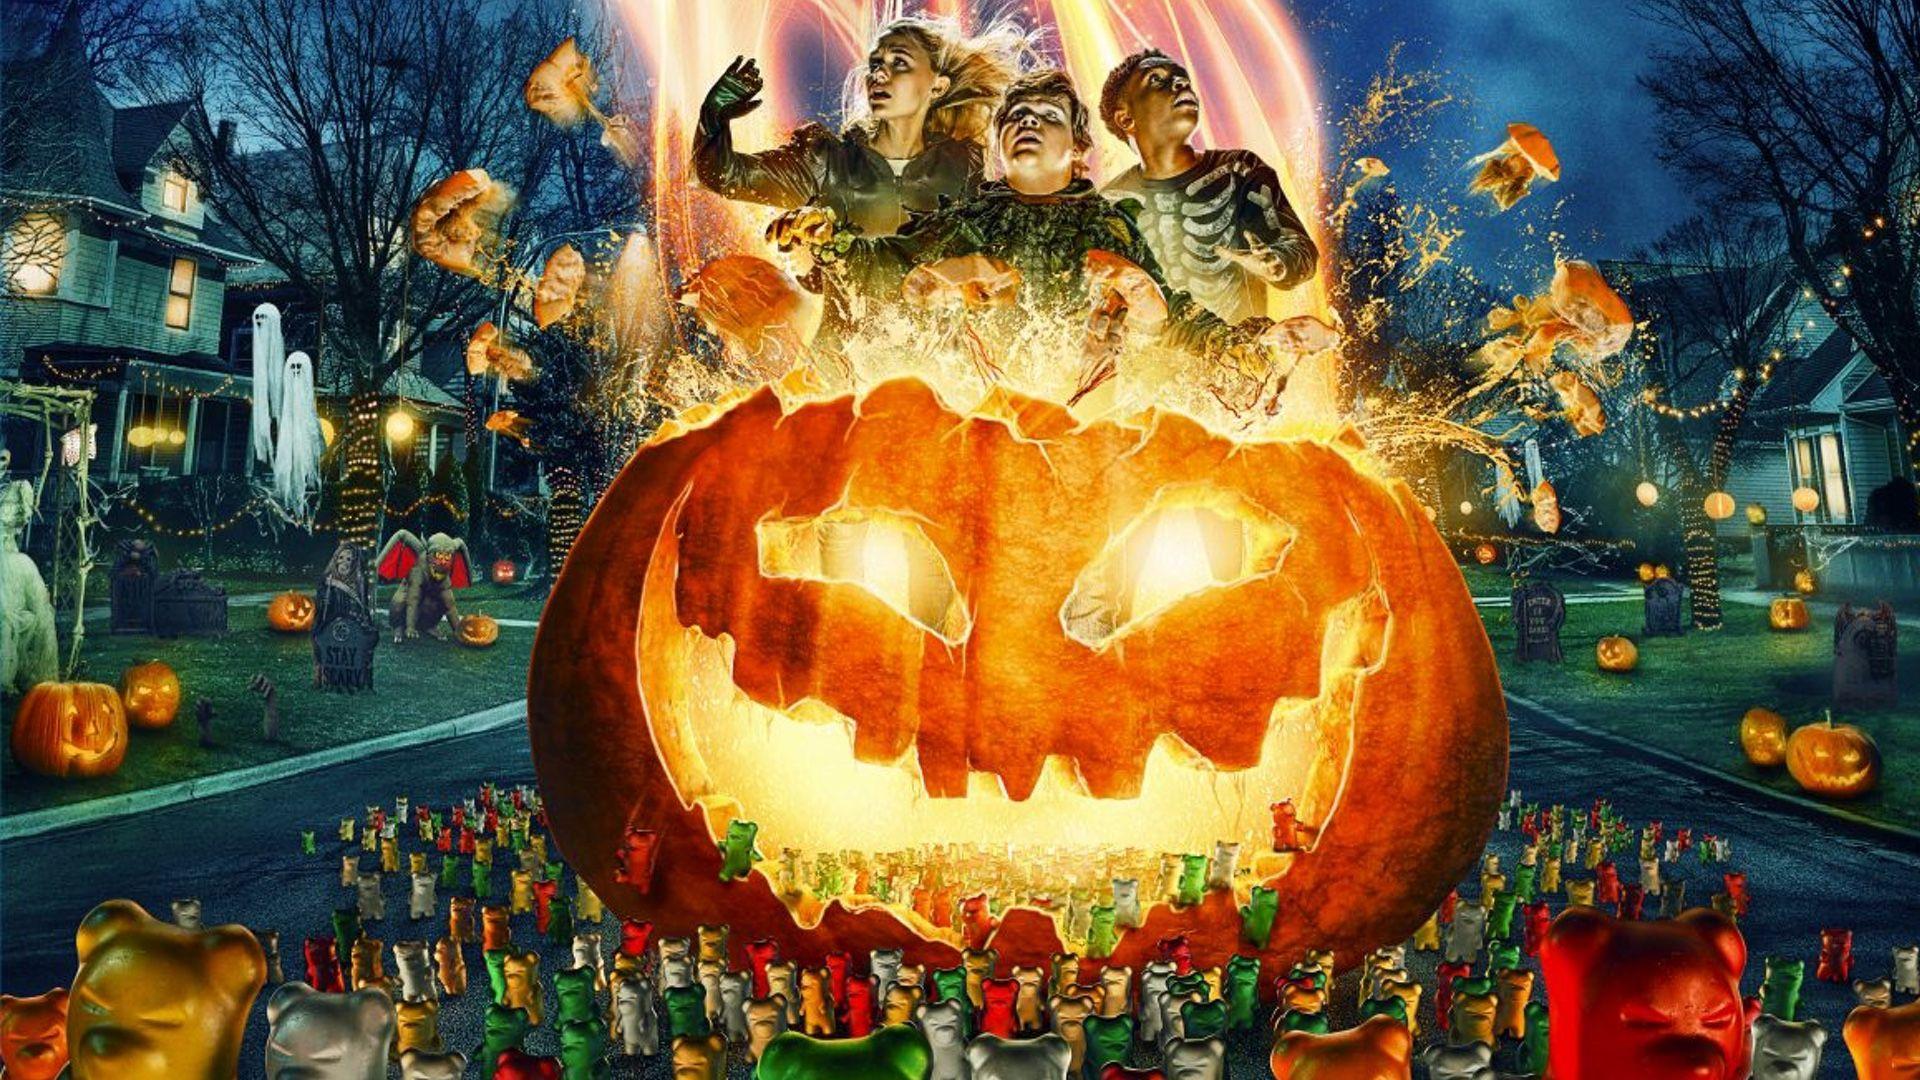 Michael Myers Halloween Wallpapers background